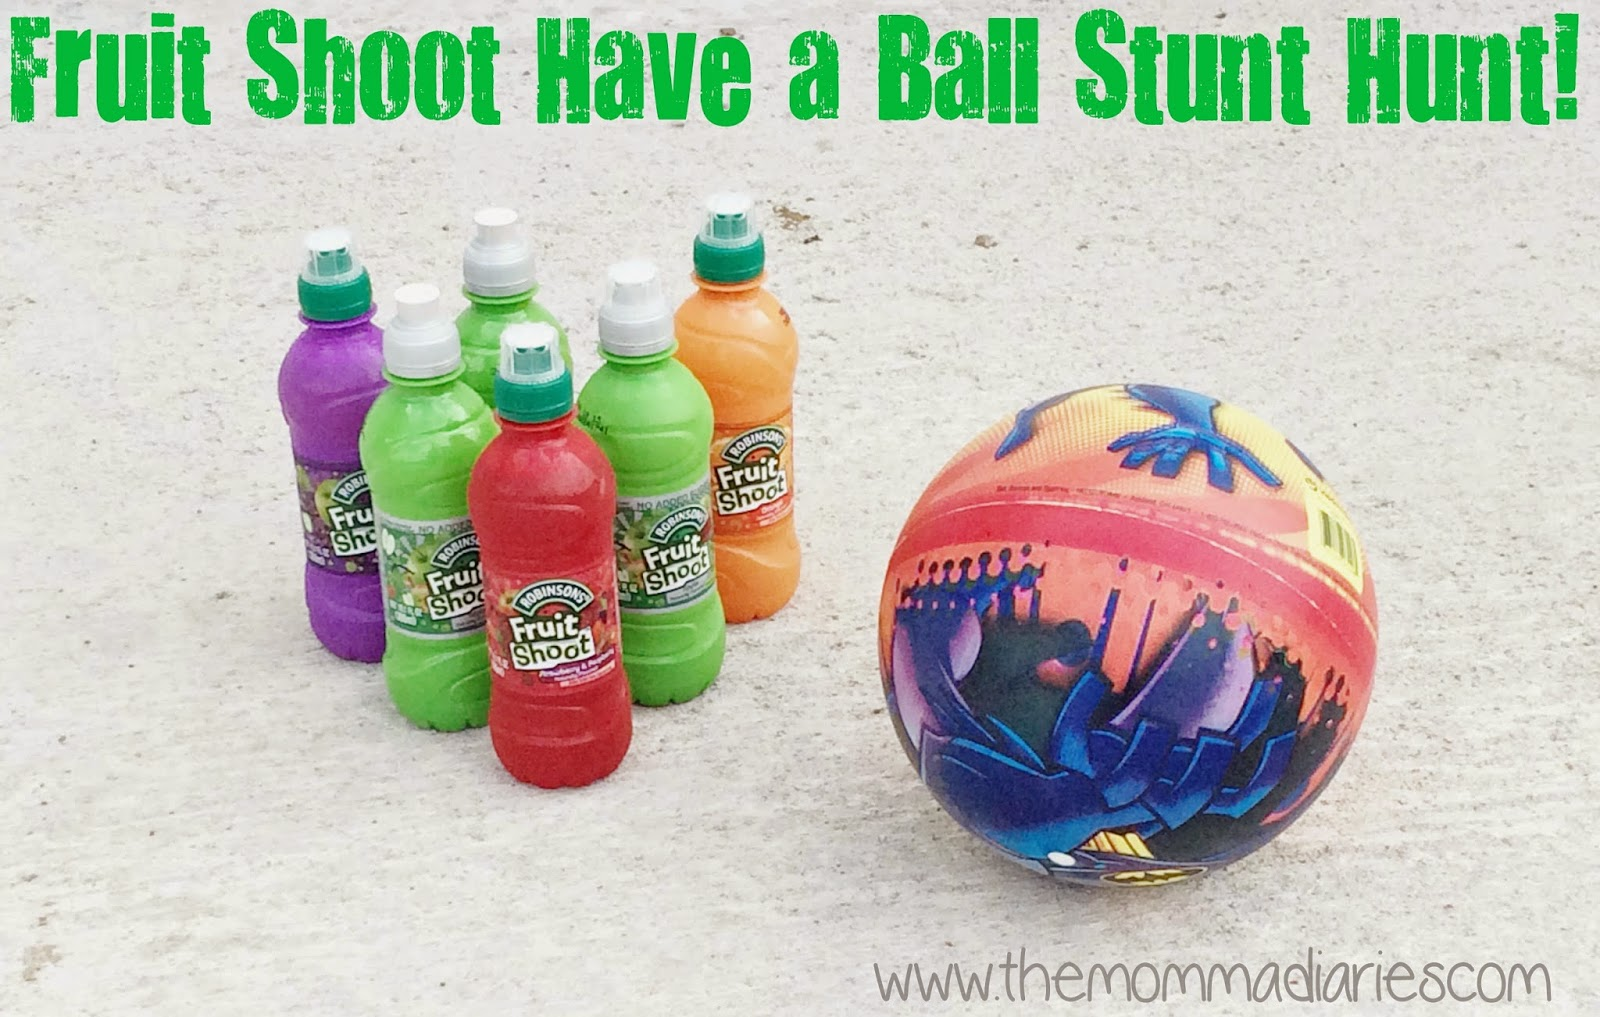 #fruitshoot #stunthunt